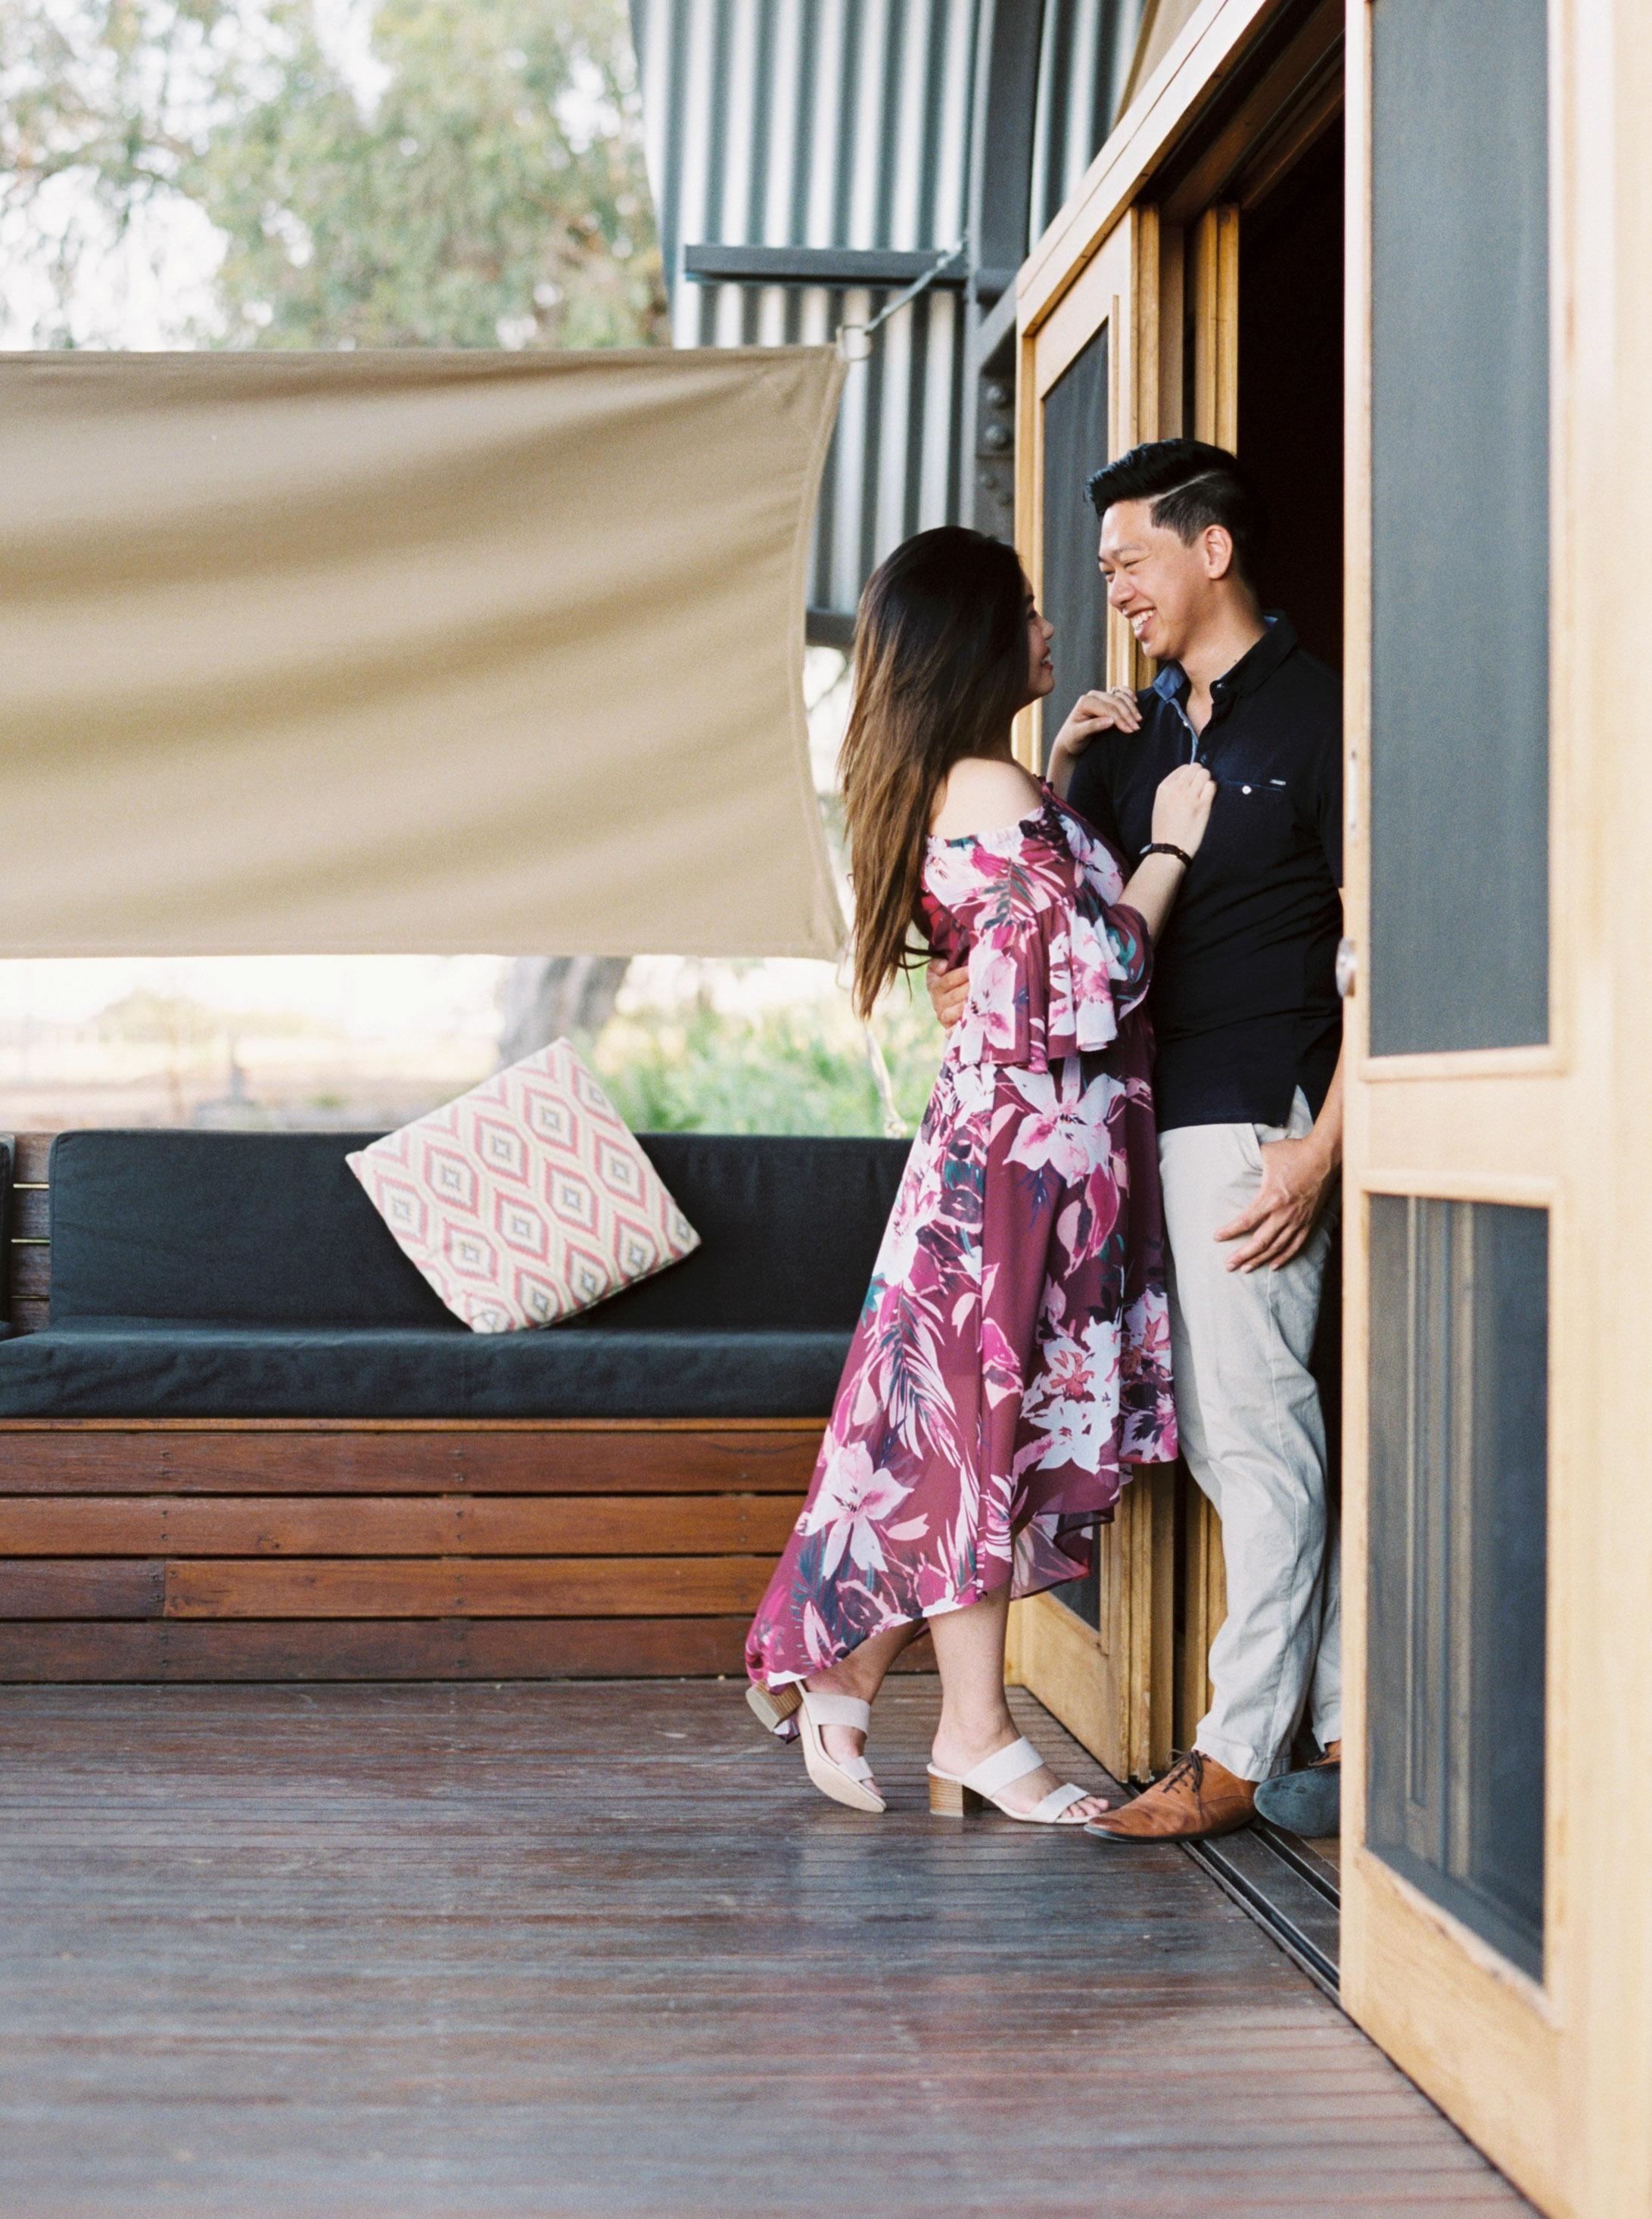 00018- Dubbo Mudgee Orange NSW Wedding Photographer Sheri McMahon.jpg